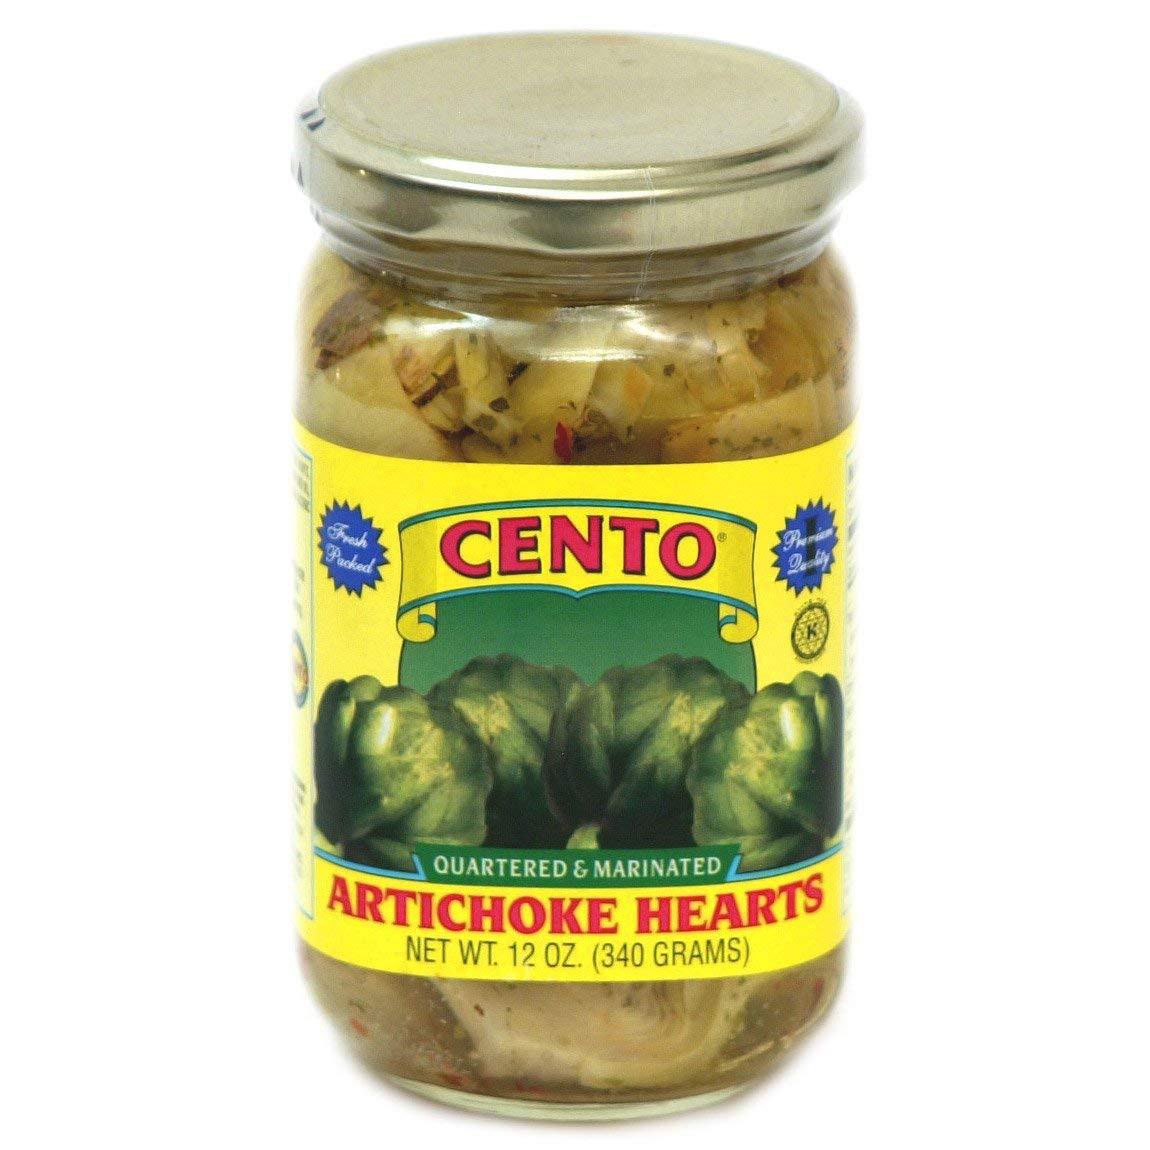 Cento - Marinated Artichoke Phoenix Mall Hearts Jars Super-cheap 4 oz. 12